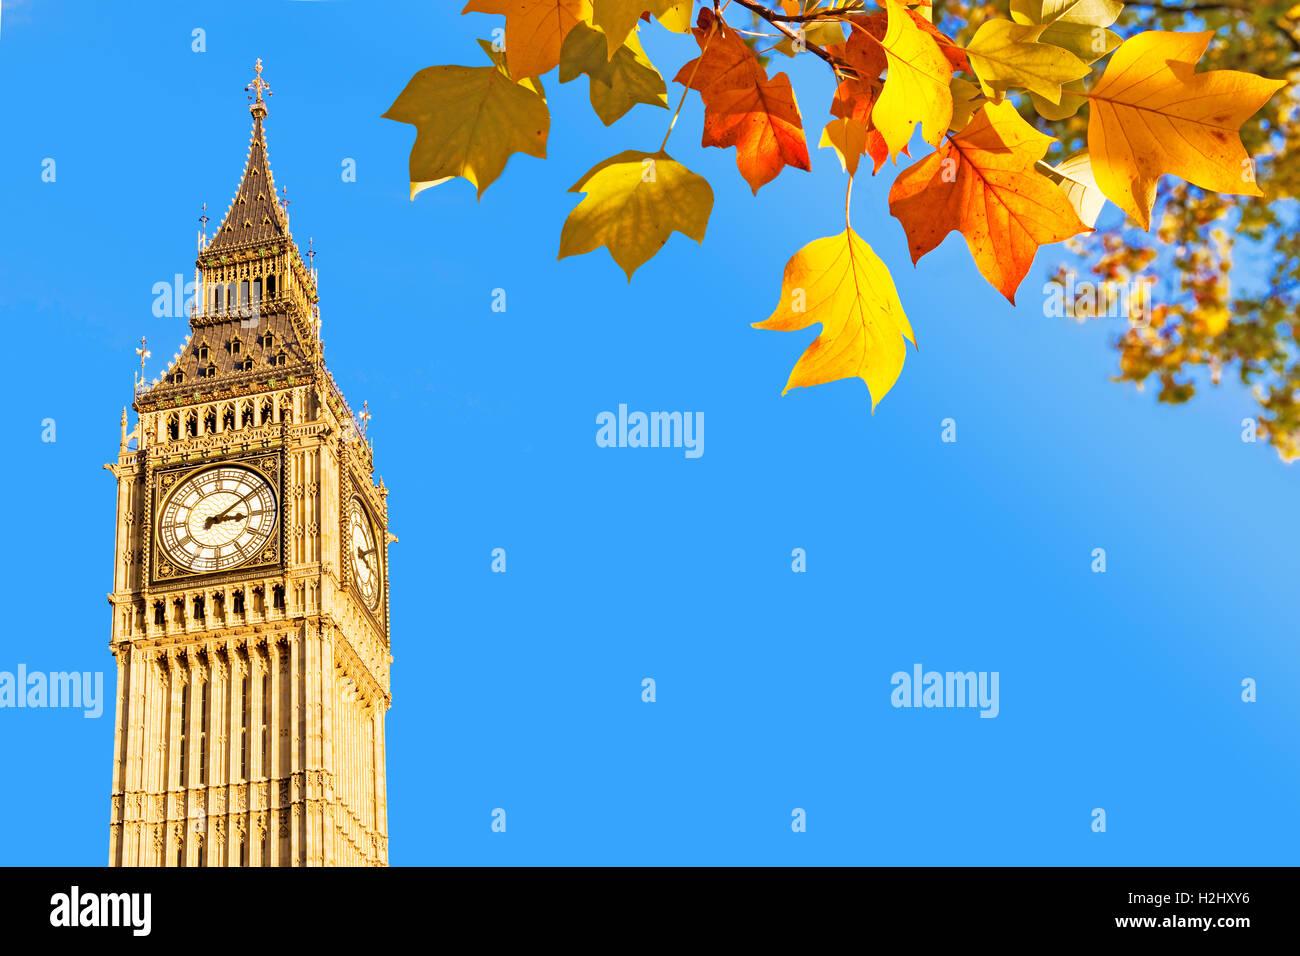 Big Ben and autumnal leaves, London, UK - Stock Image